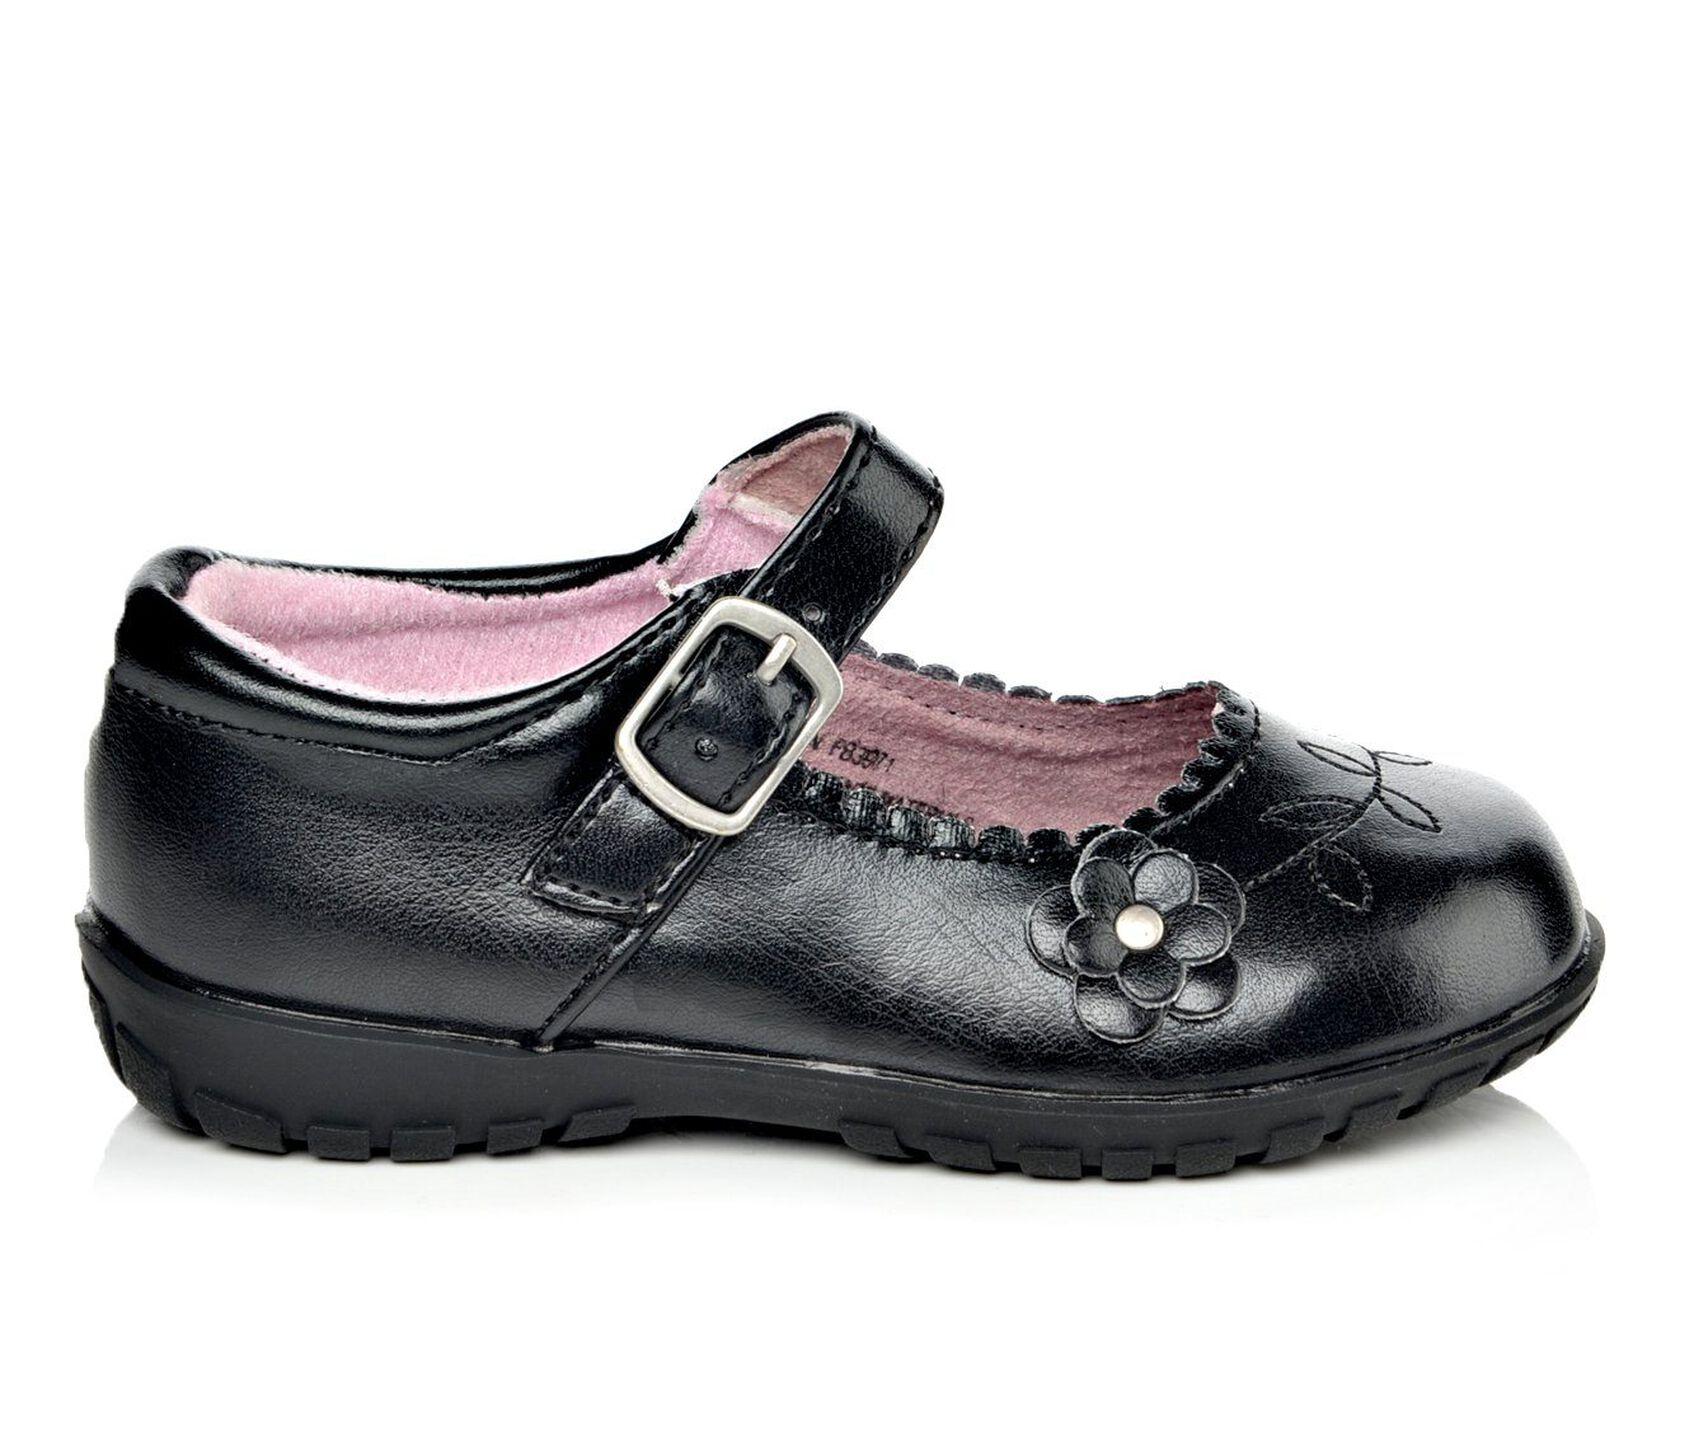 Shoe Carnival Casual Dress Shoes